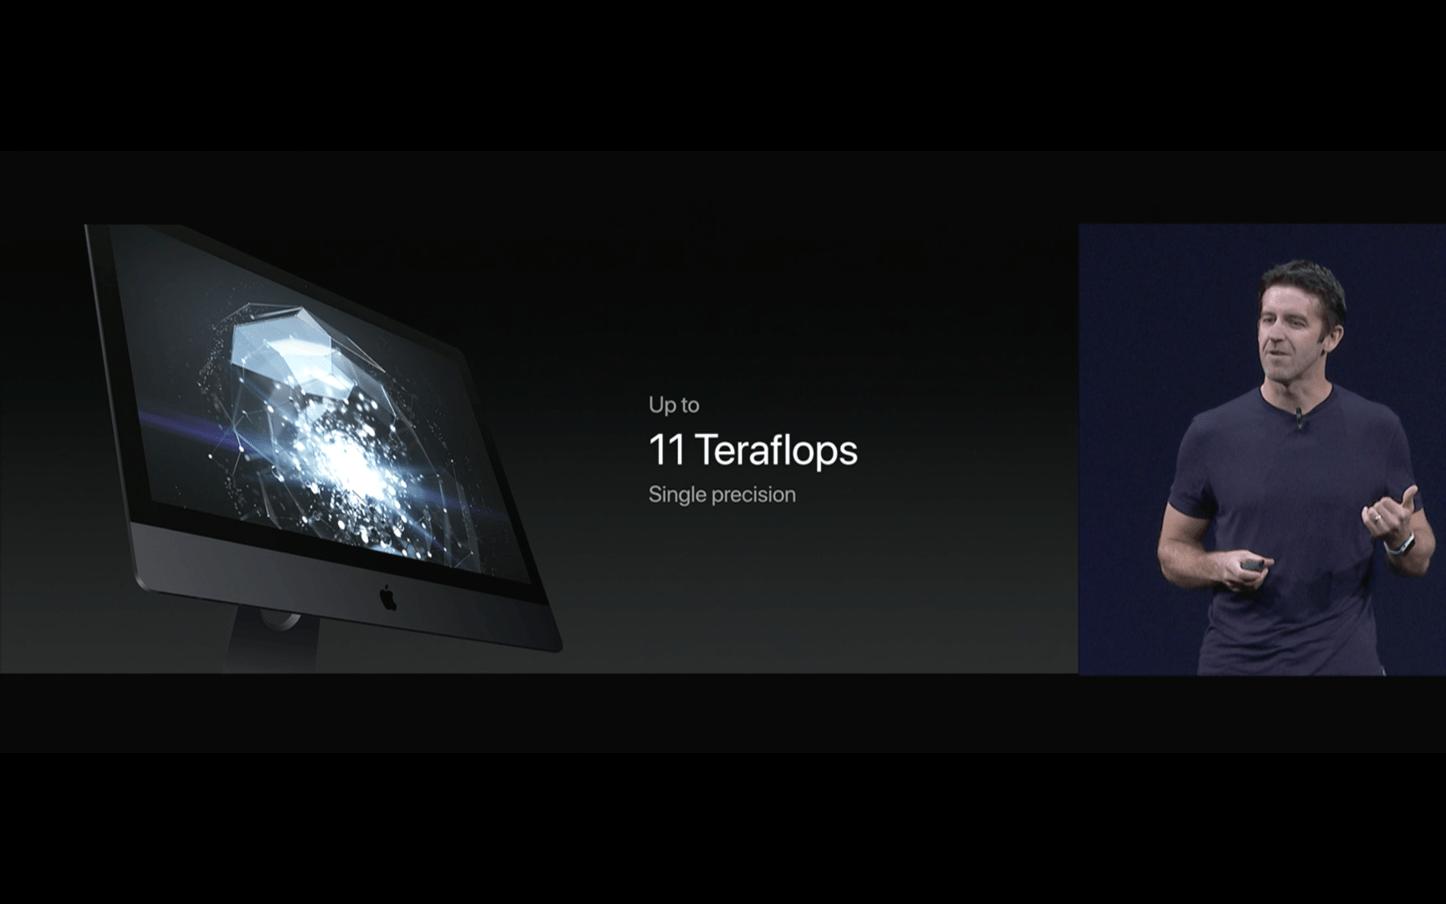 iMac-Pro-2017-WWDC17-14.png